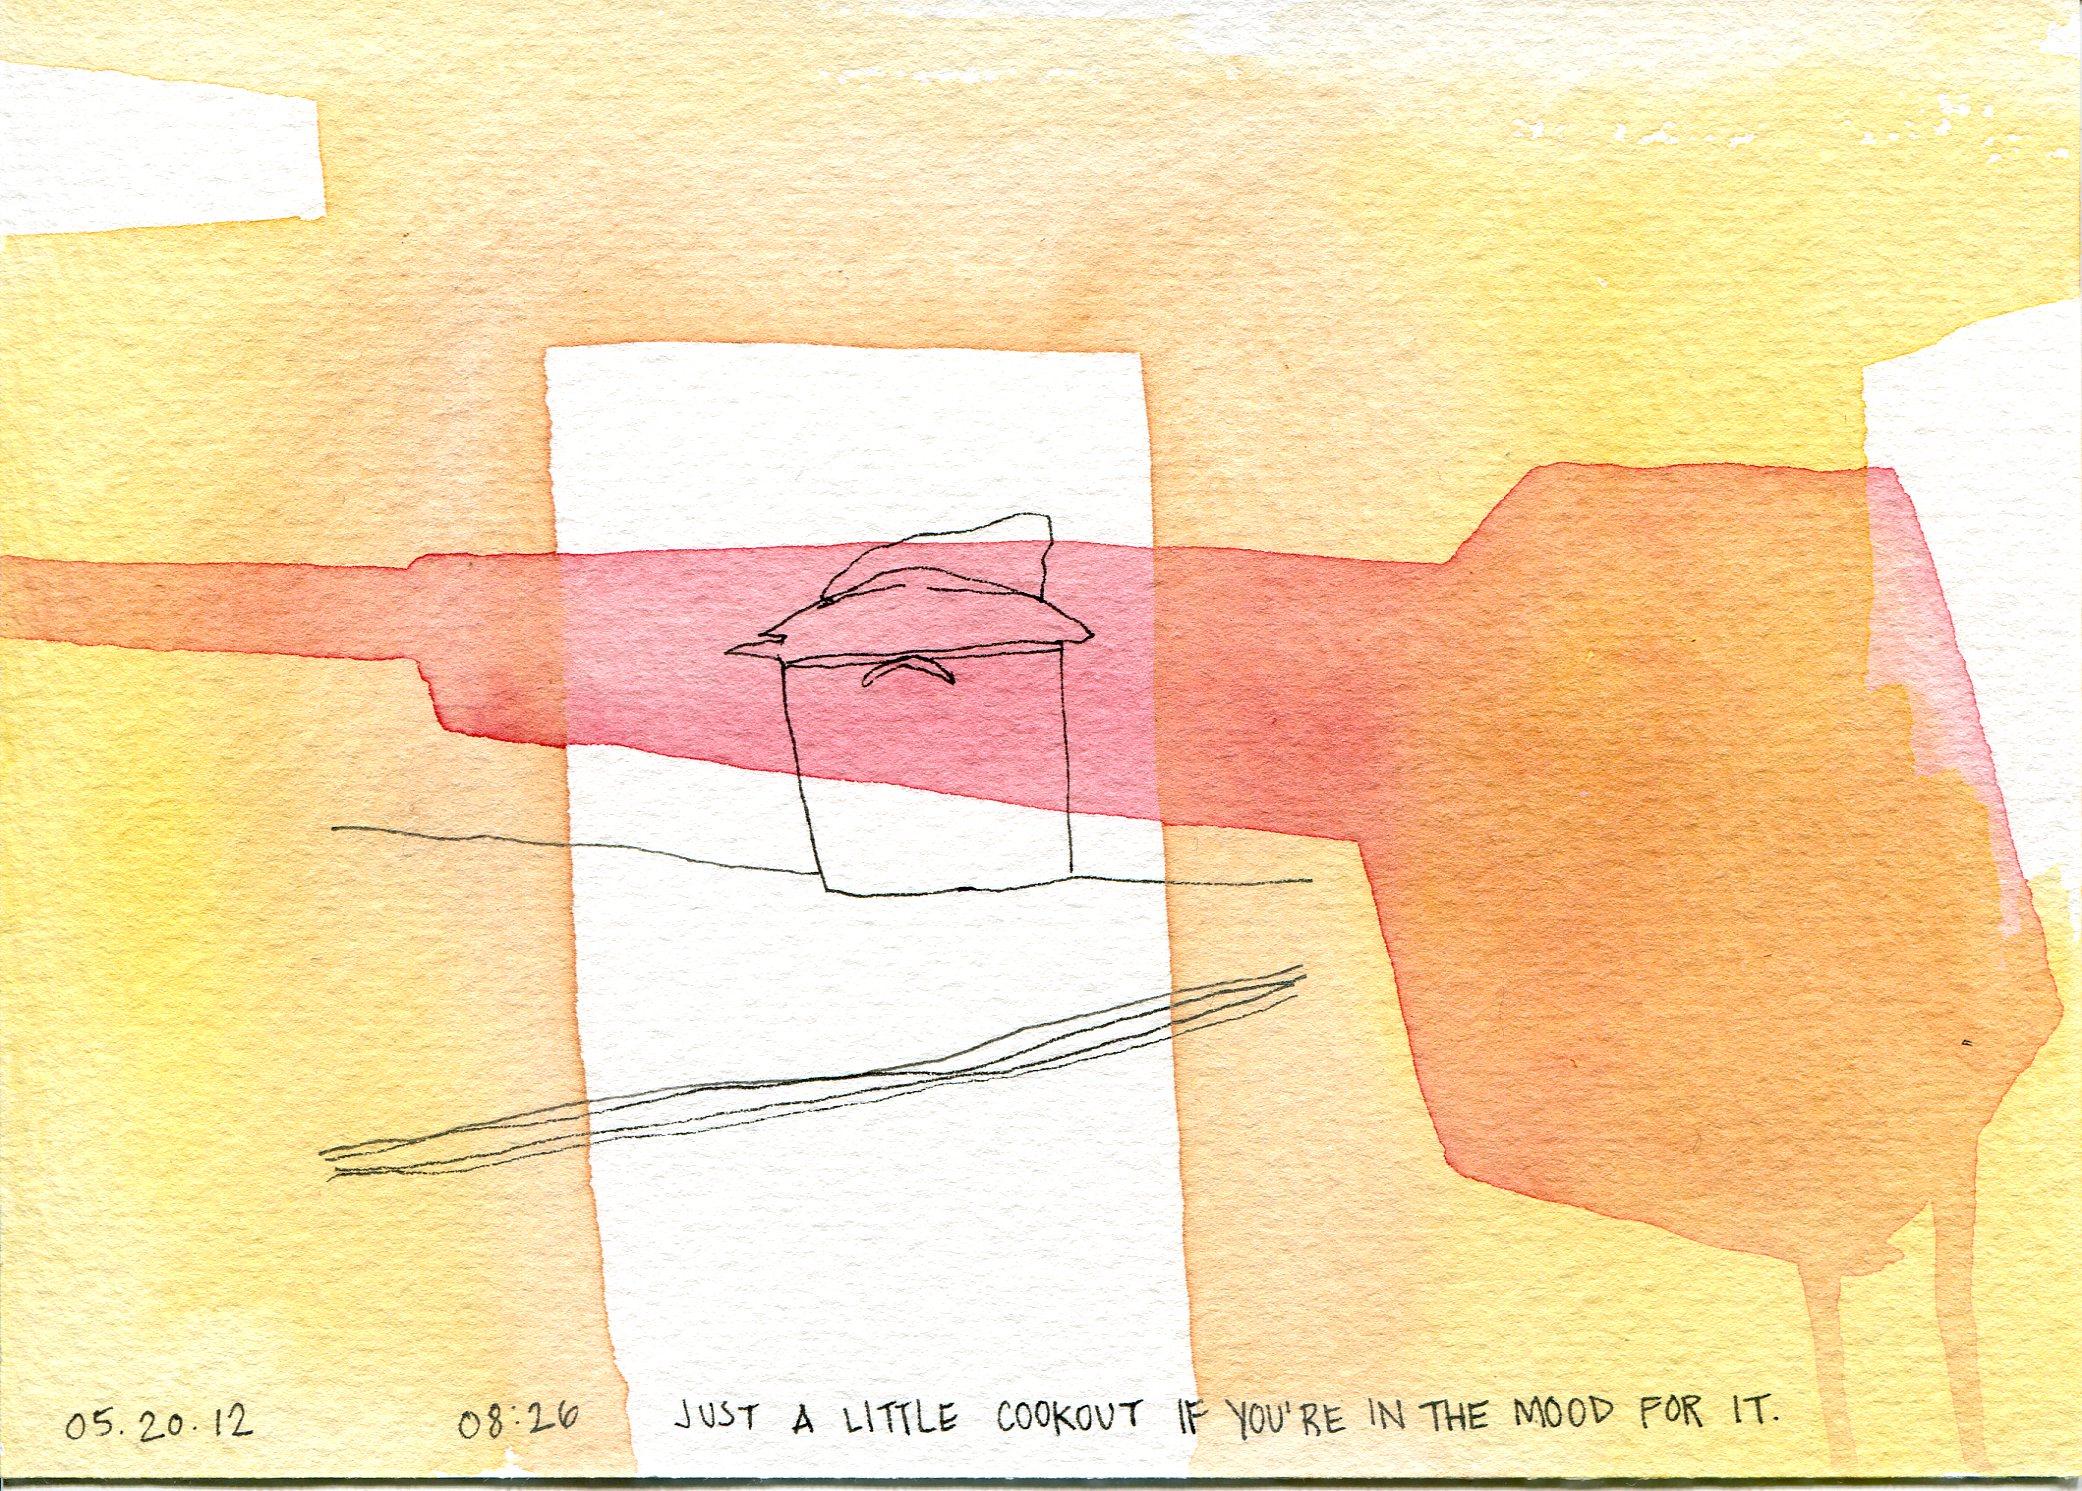 2012-05-27 drawing001.jpg